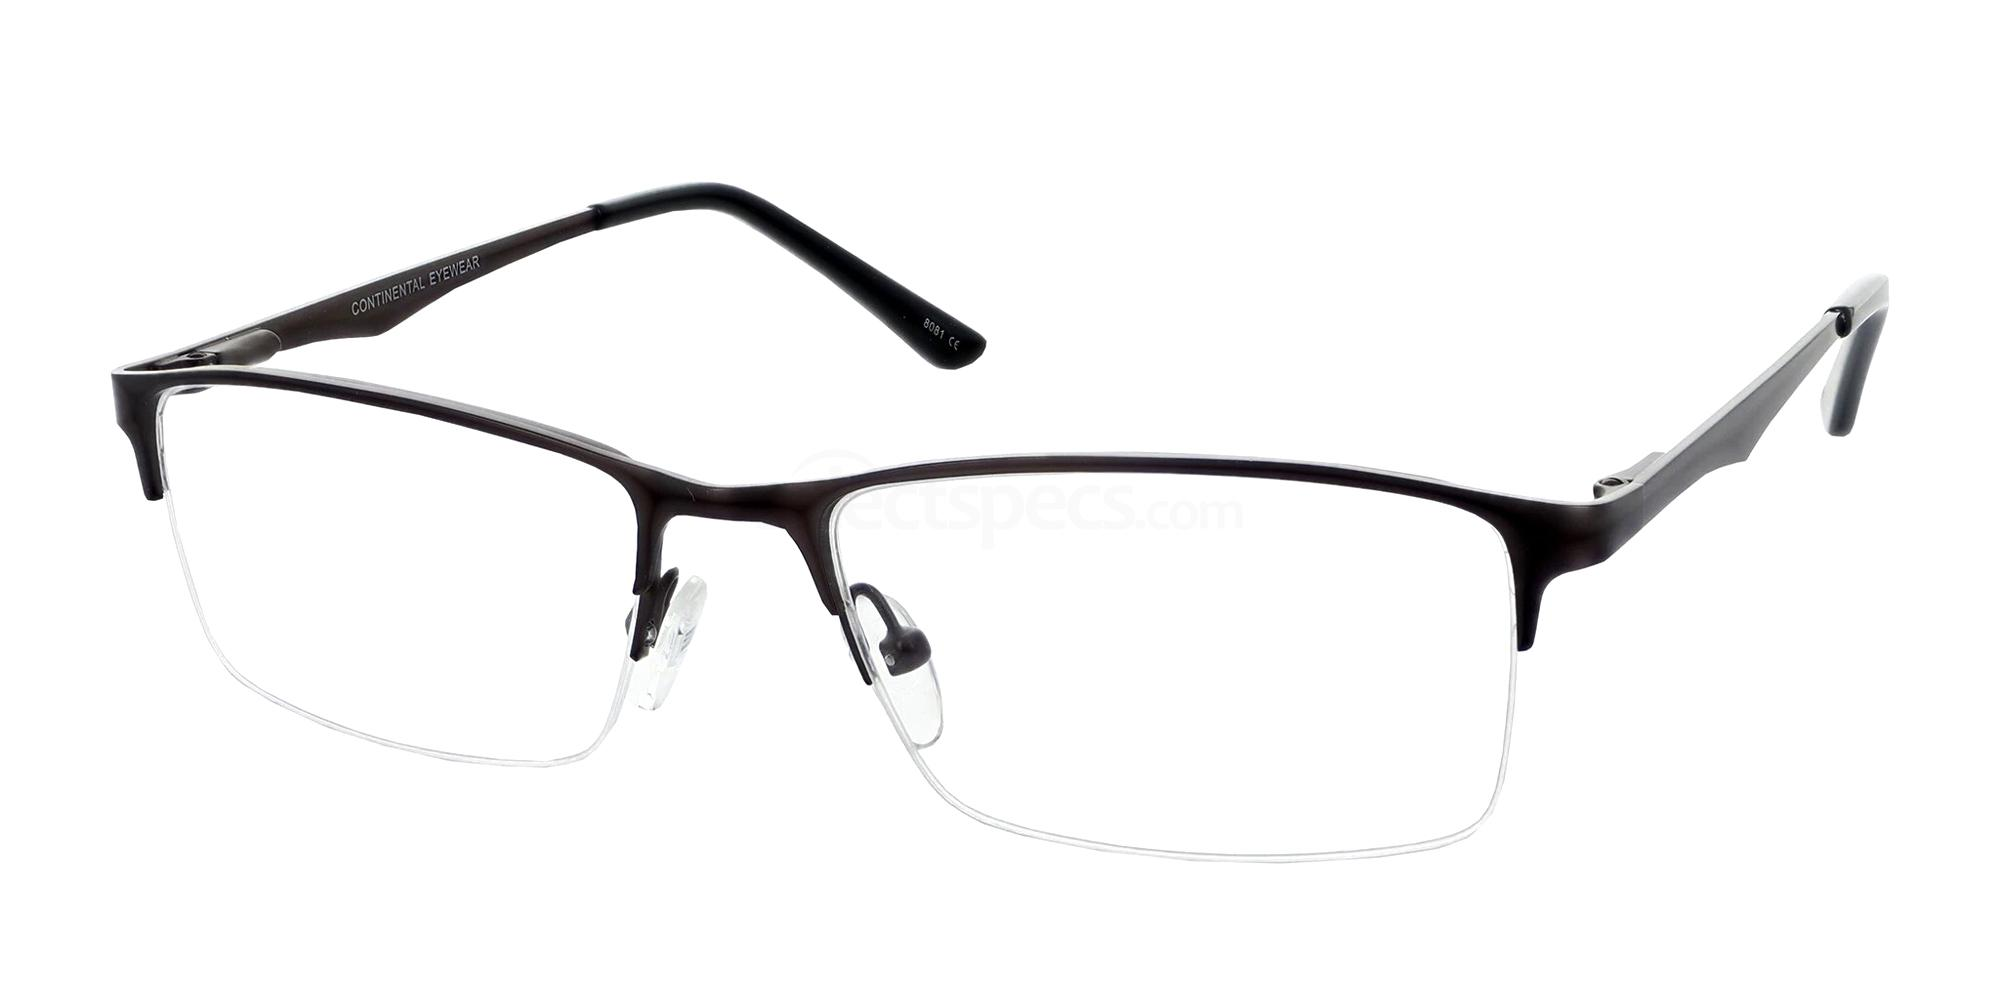 Gun JON Glasses, Cameo